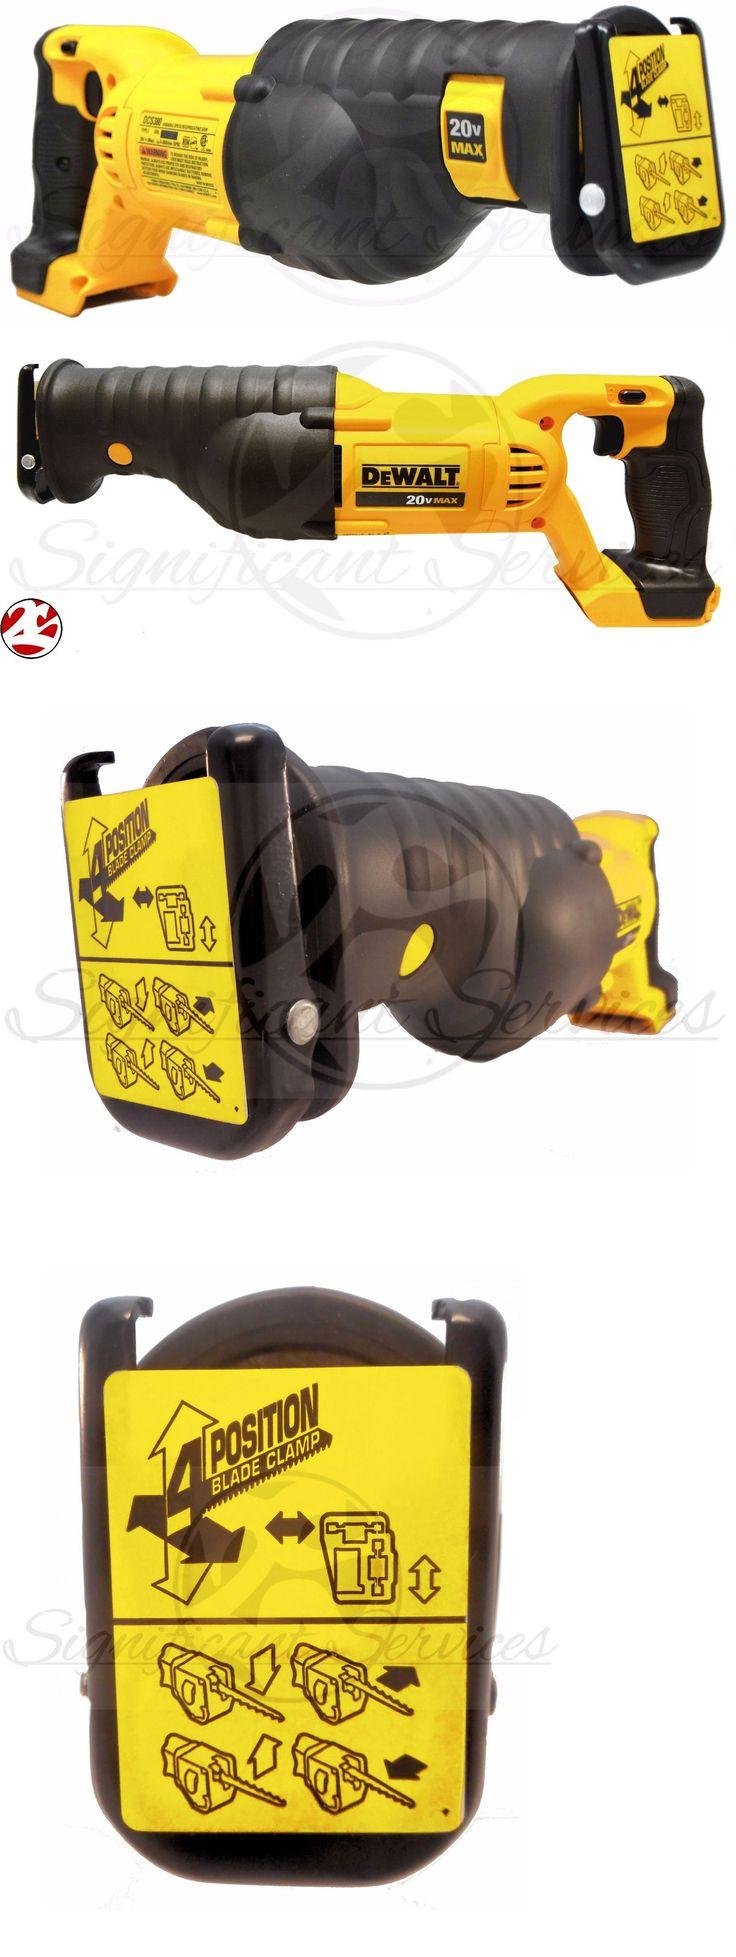 tools: New Dewalt Dcs380 20V 20 Volt Max Li-Ion Cordless Reciprocating Saw Sawzall Tool -> BUY IT NOW ONLY: $94.03 on eBay!